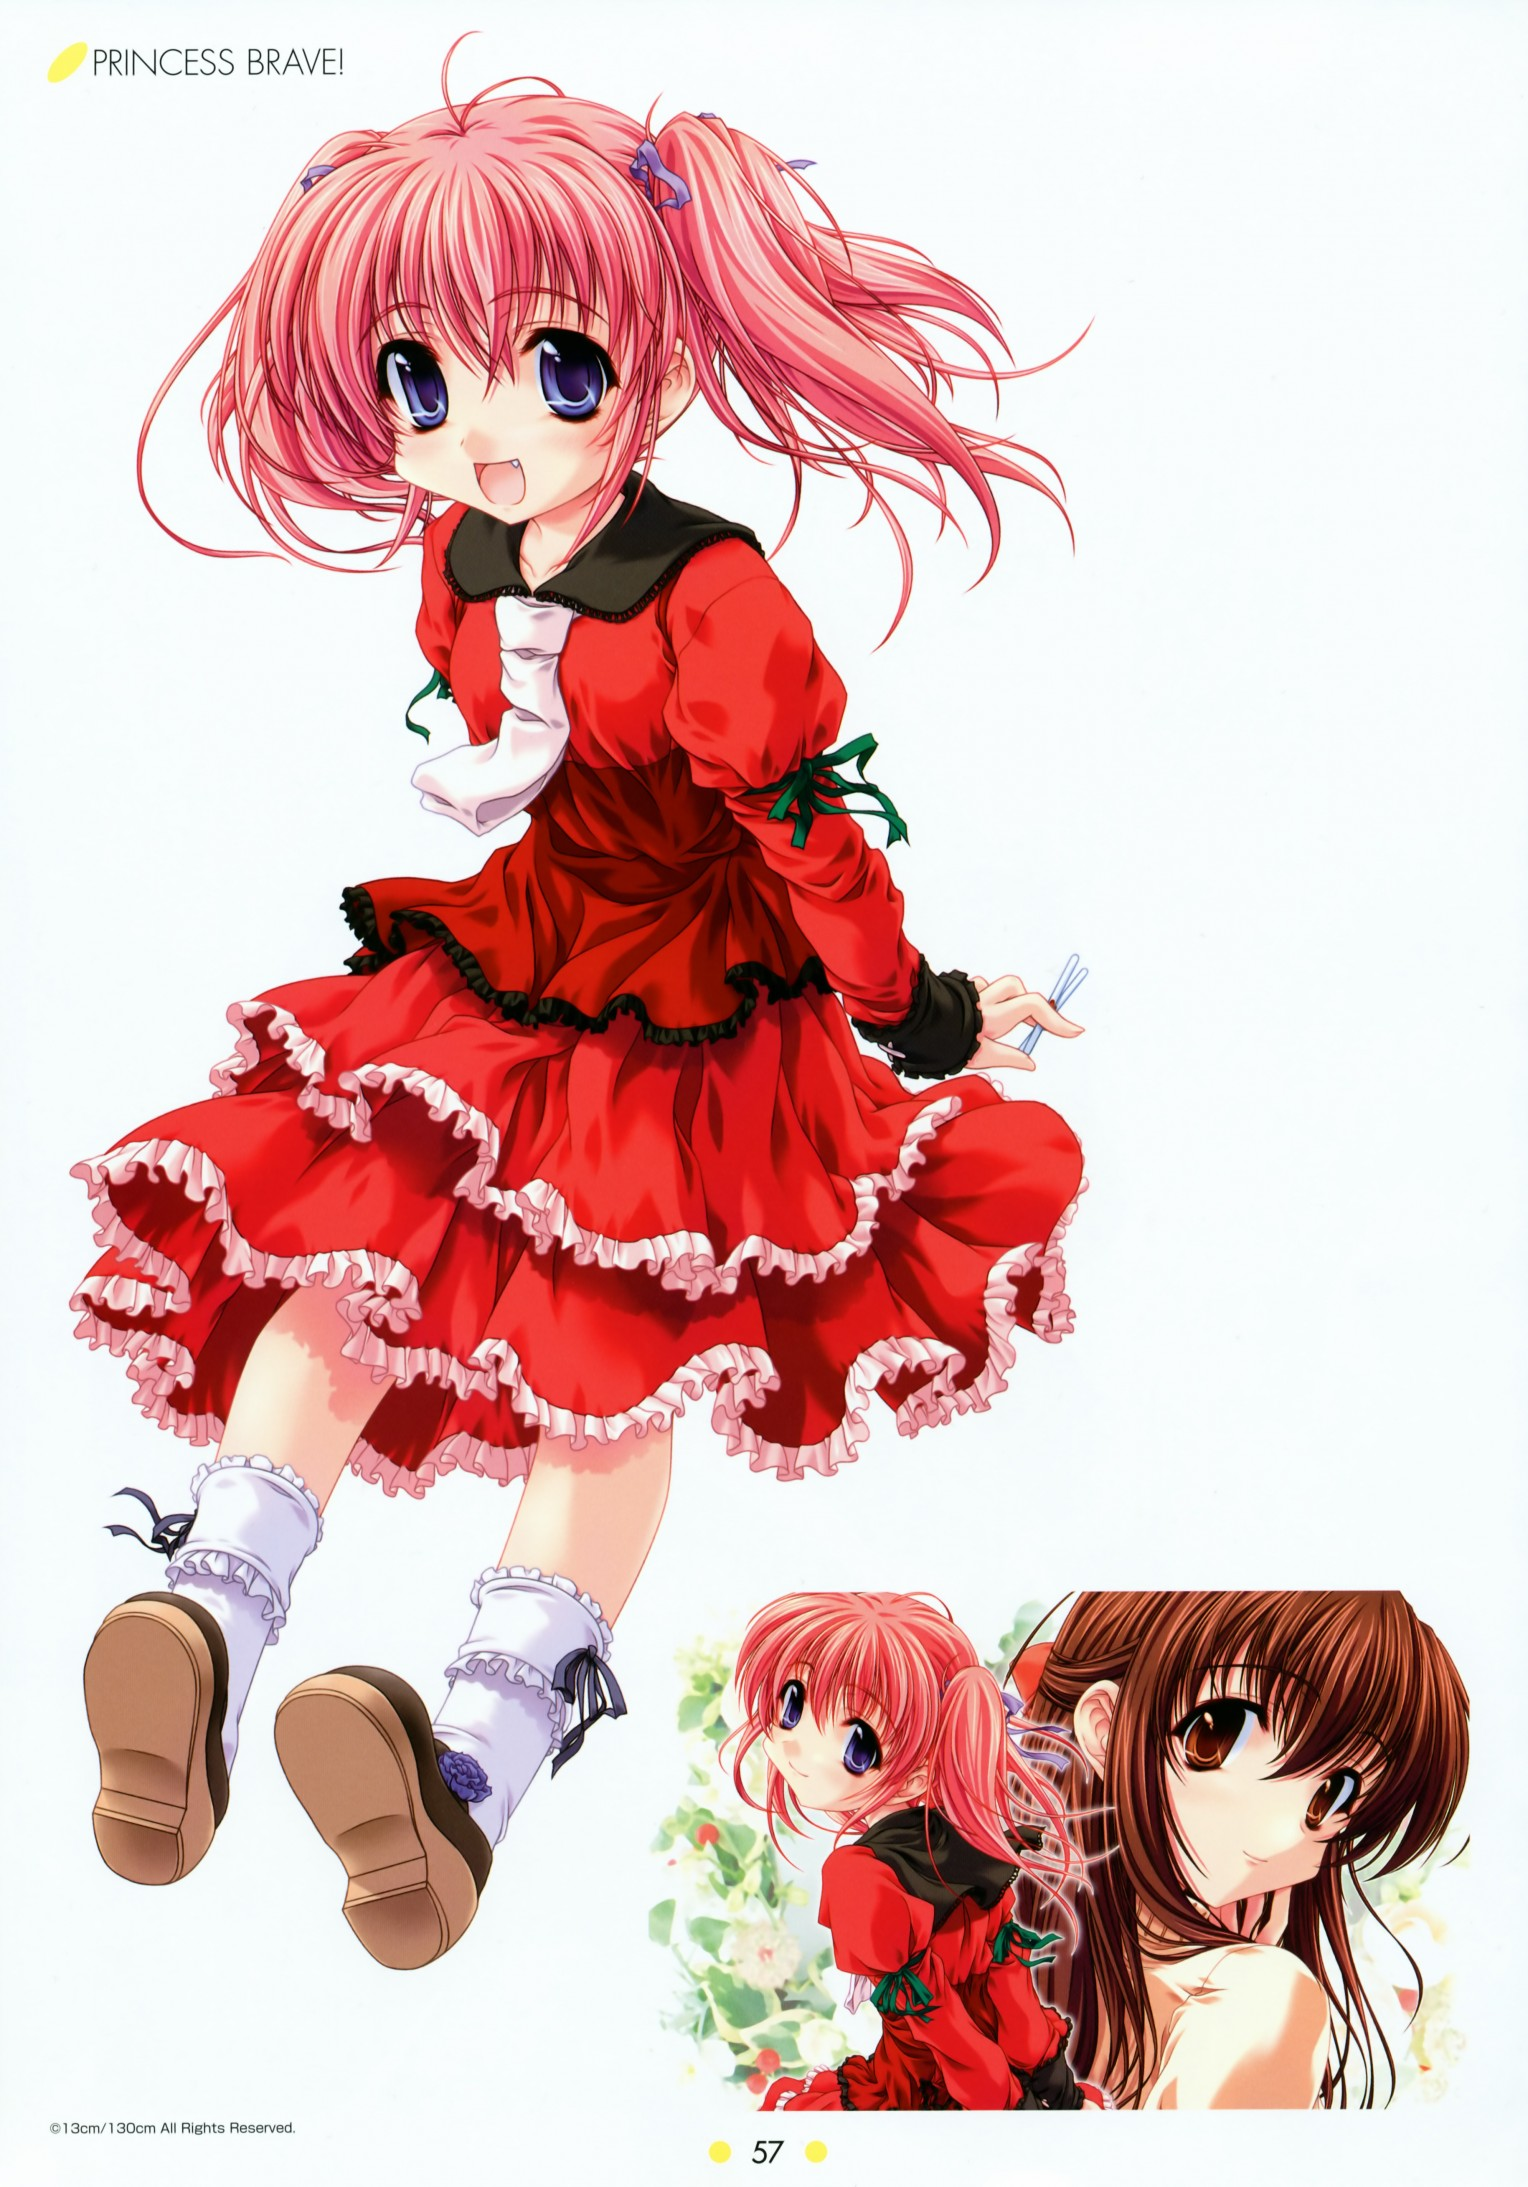 Princess bride zerochan anime image board for Zerochan anime